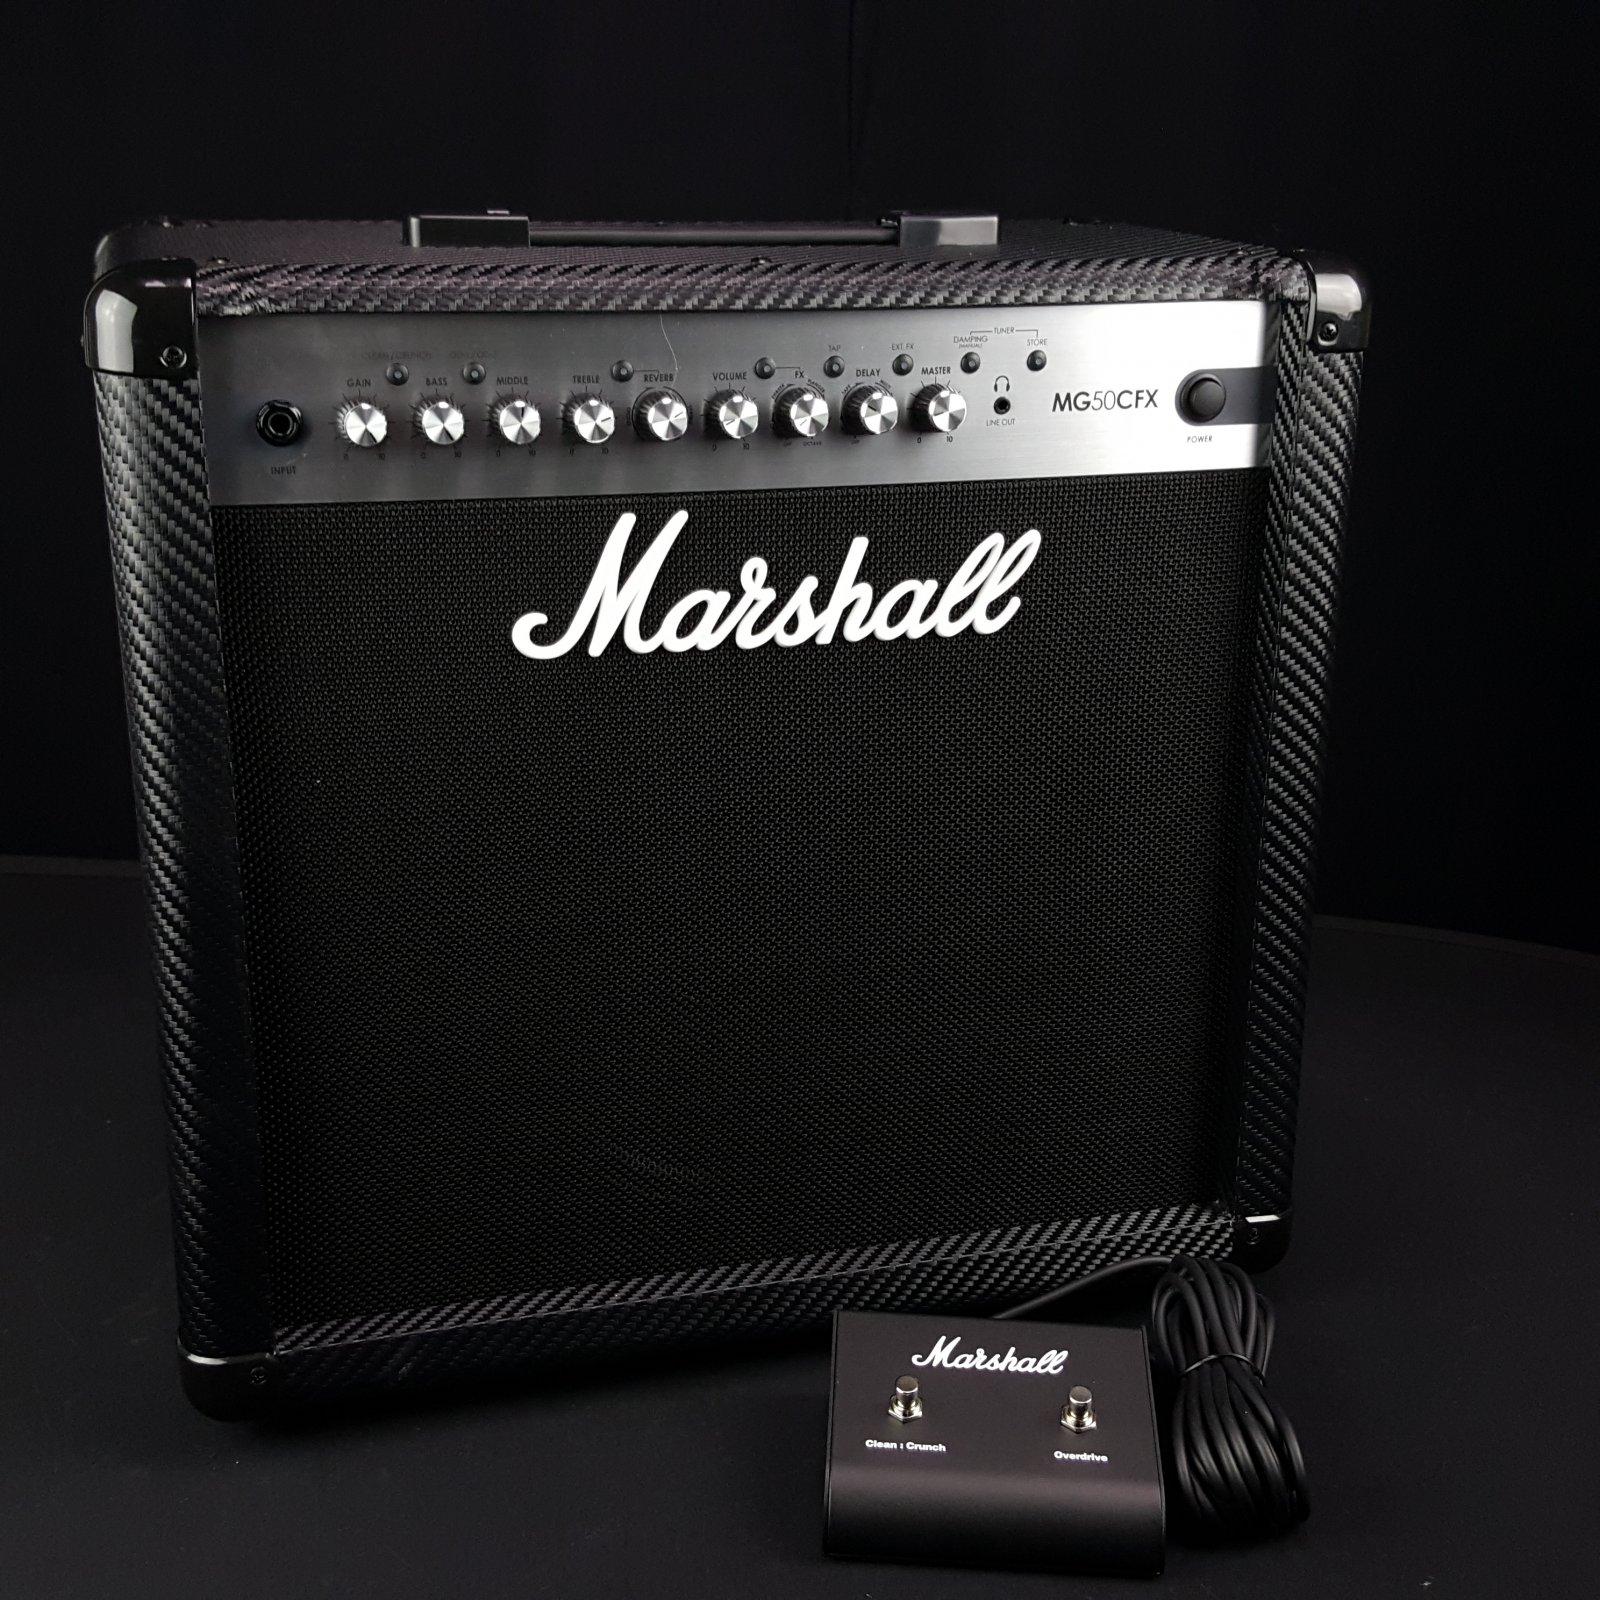 Marshall MG50CFX 12 Combo Guitar Amplifier